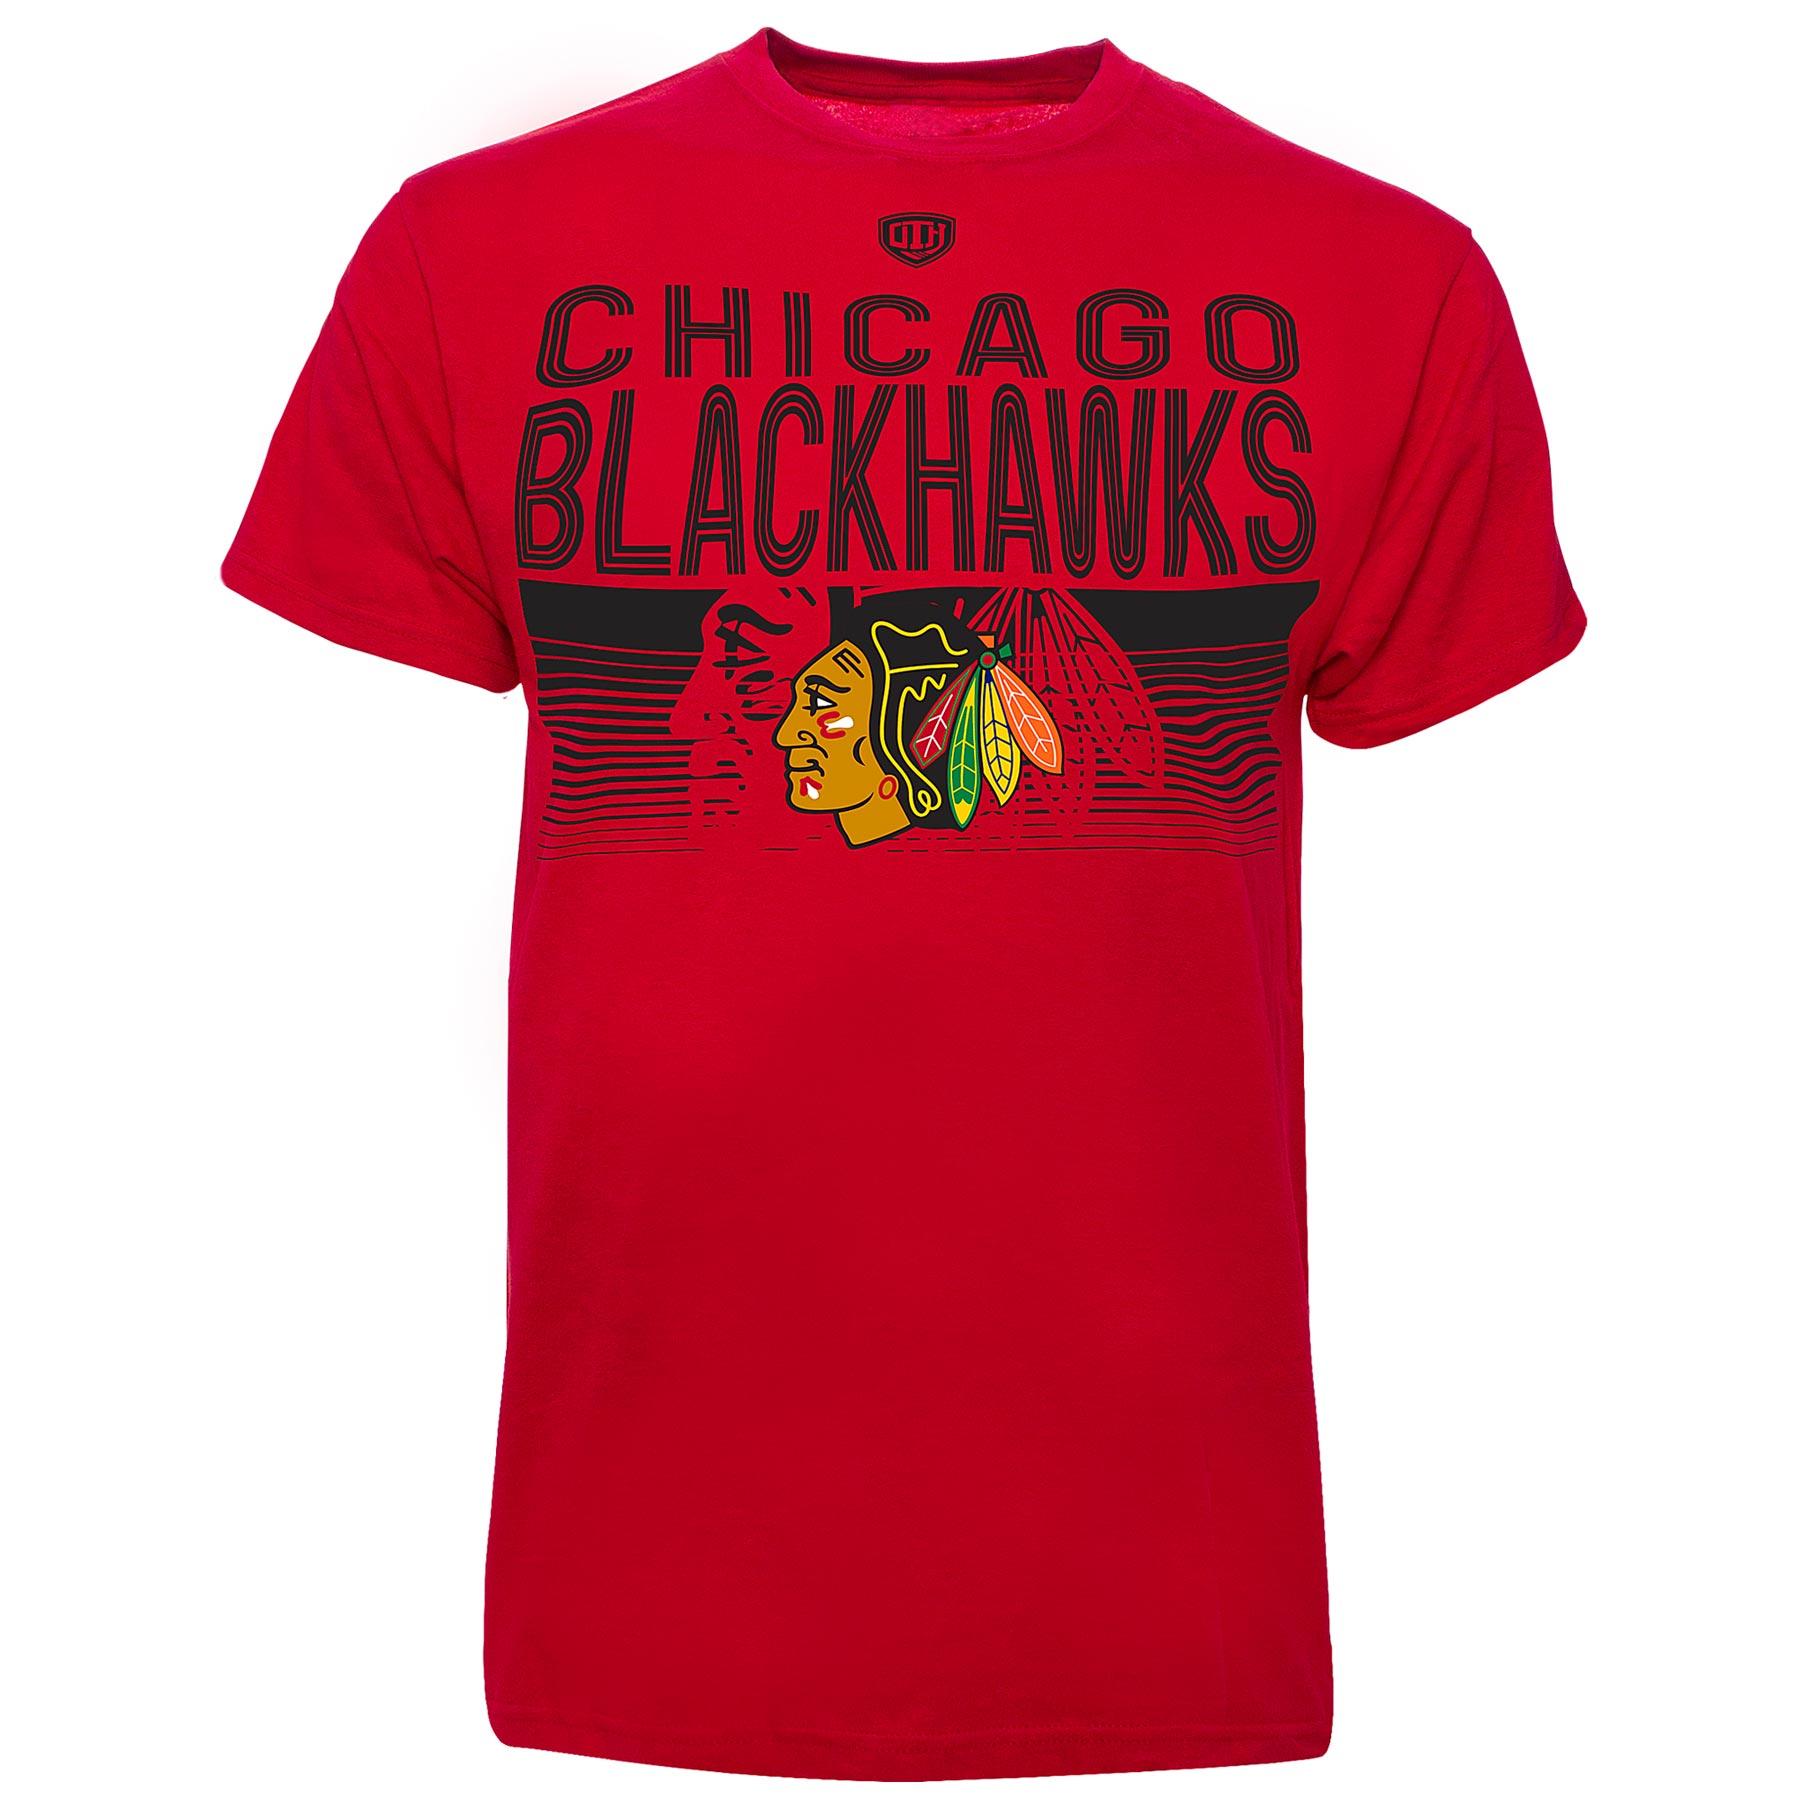 Chicago Blackhawks Youth Arrow T-Shirt - Old Time Hockey - image 1 de 1